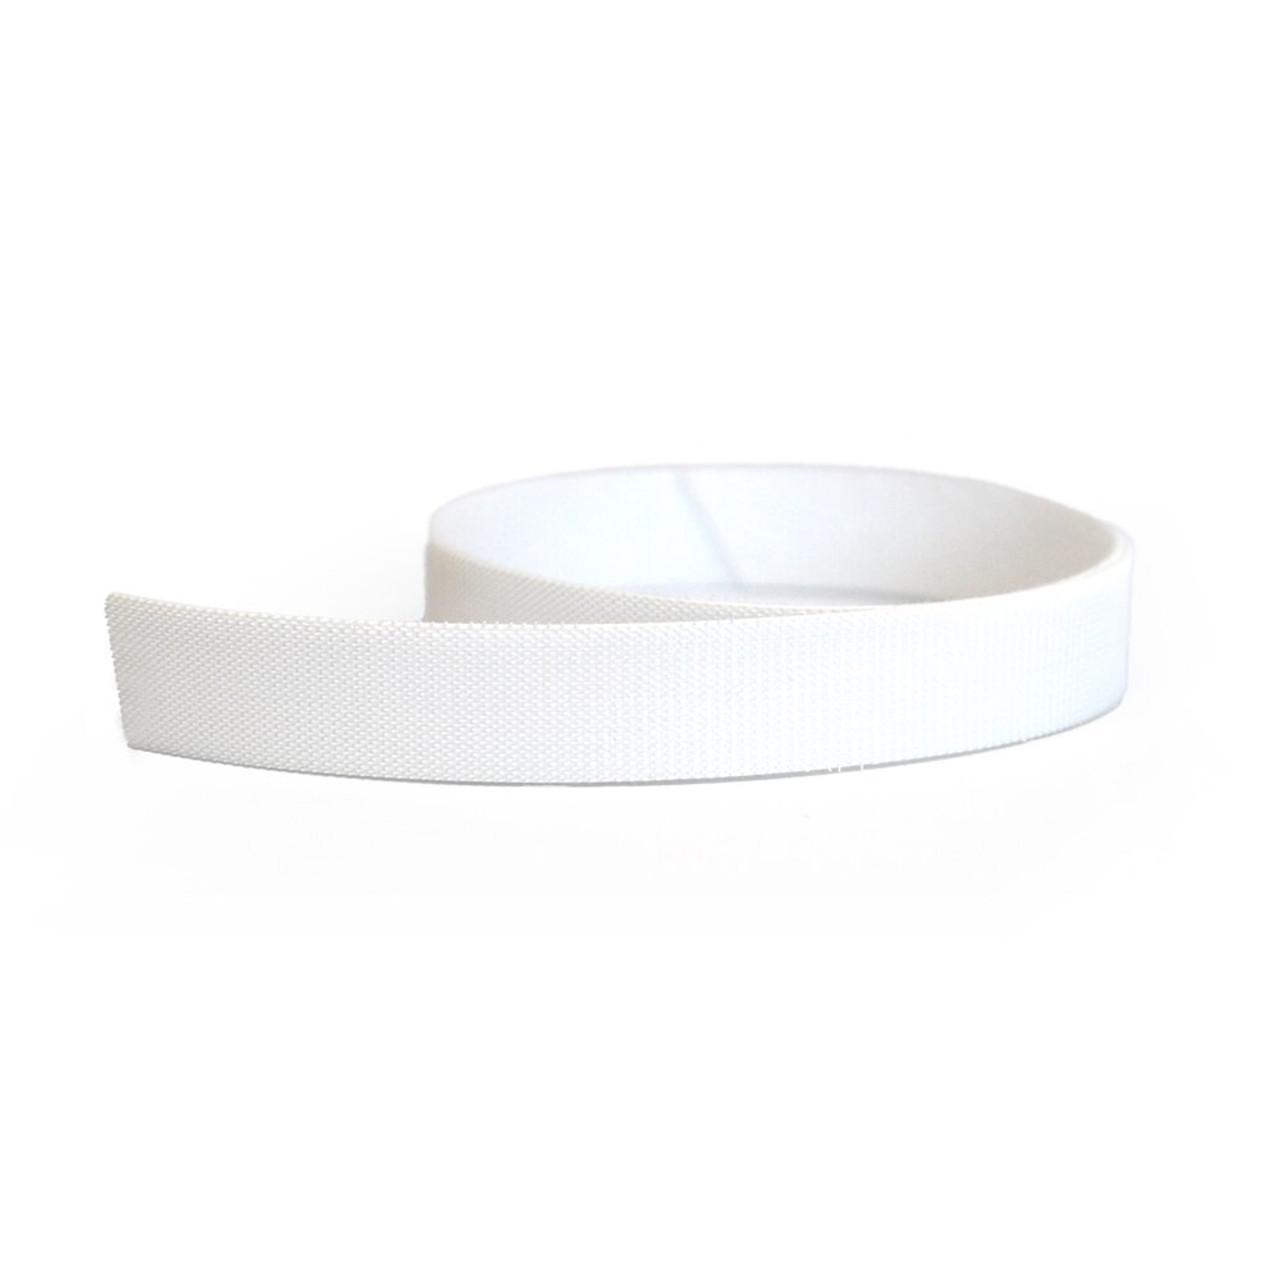 VELCRO® Brand QWIK Tie Tape White / Velcro Straps - Bundling Straps - Velcro Tie - Velcro Strap